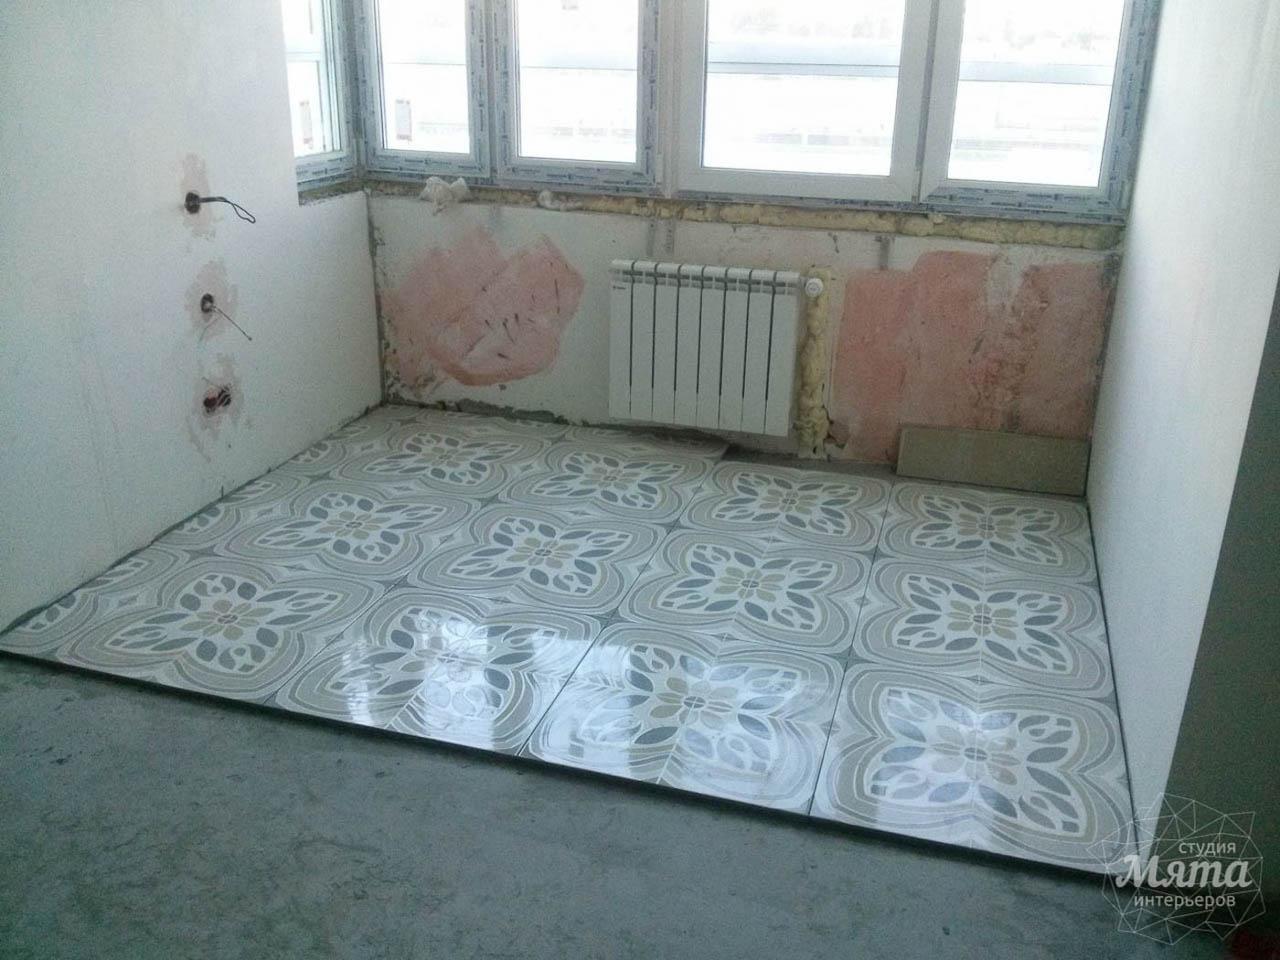 Дизайн интерьера и ремонт трехкомнатной квартиры по ул. Фучика 9 39